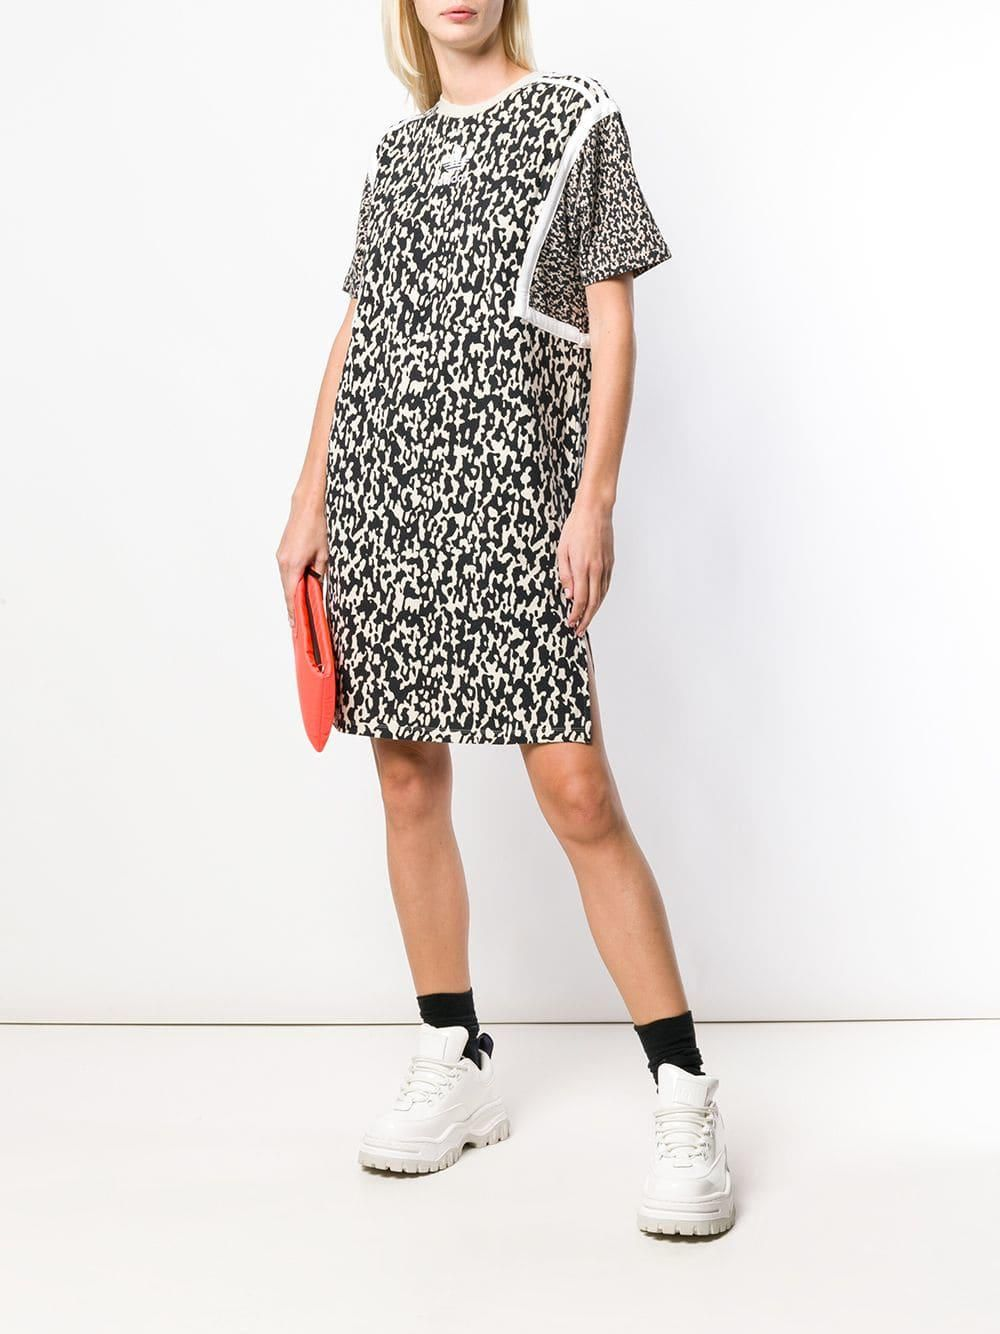 ️Adidas Women Originals LEOFLAGE TEE Dress DX4297  short  2018  multicolor   white  addidas  dressboutiques  clothesdress  sport   ... 68c30e11b